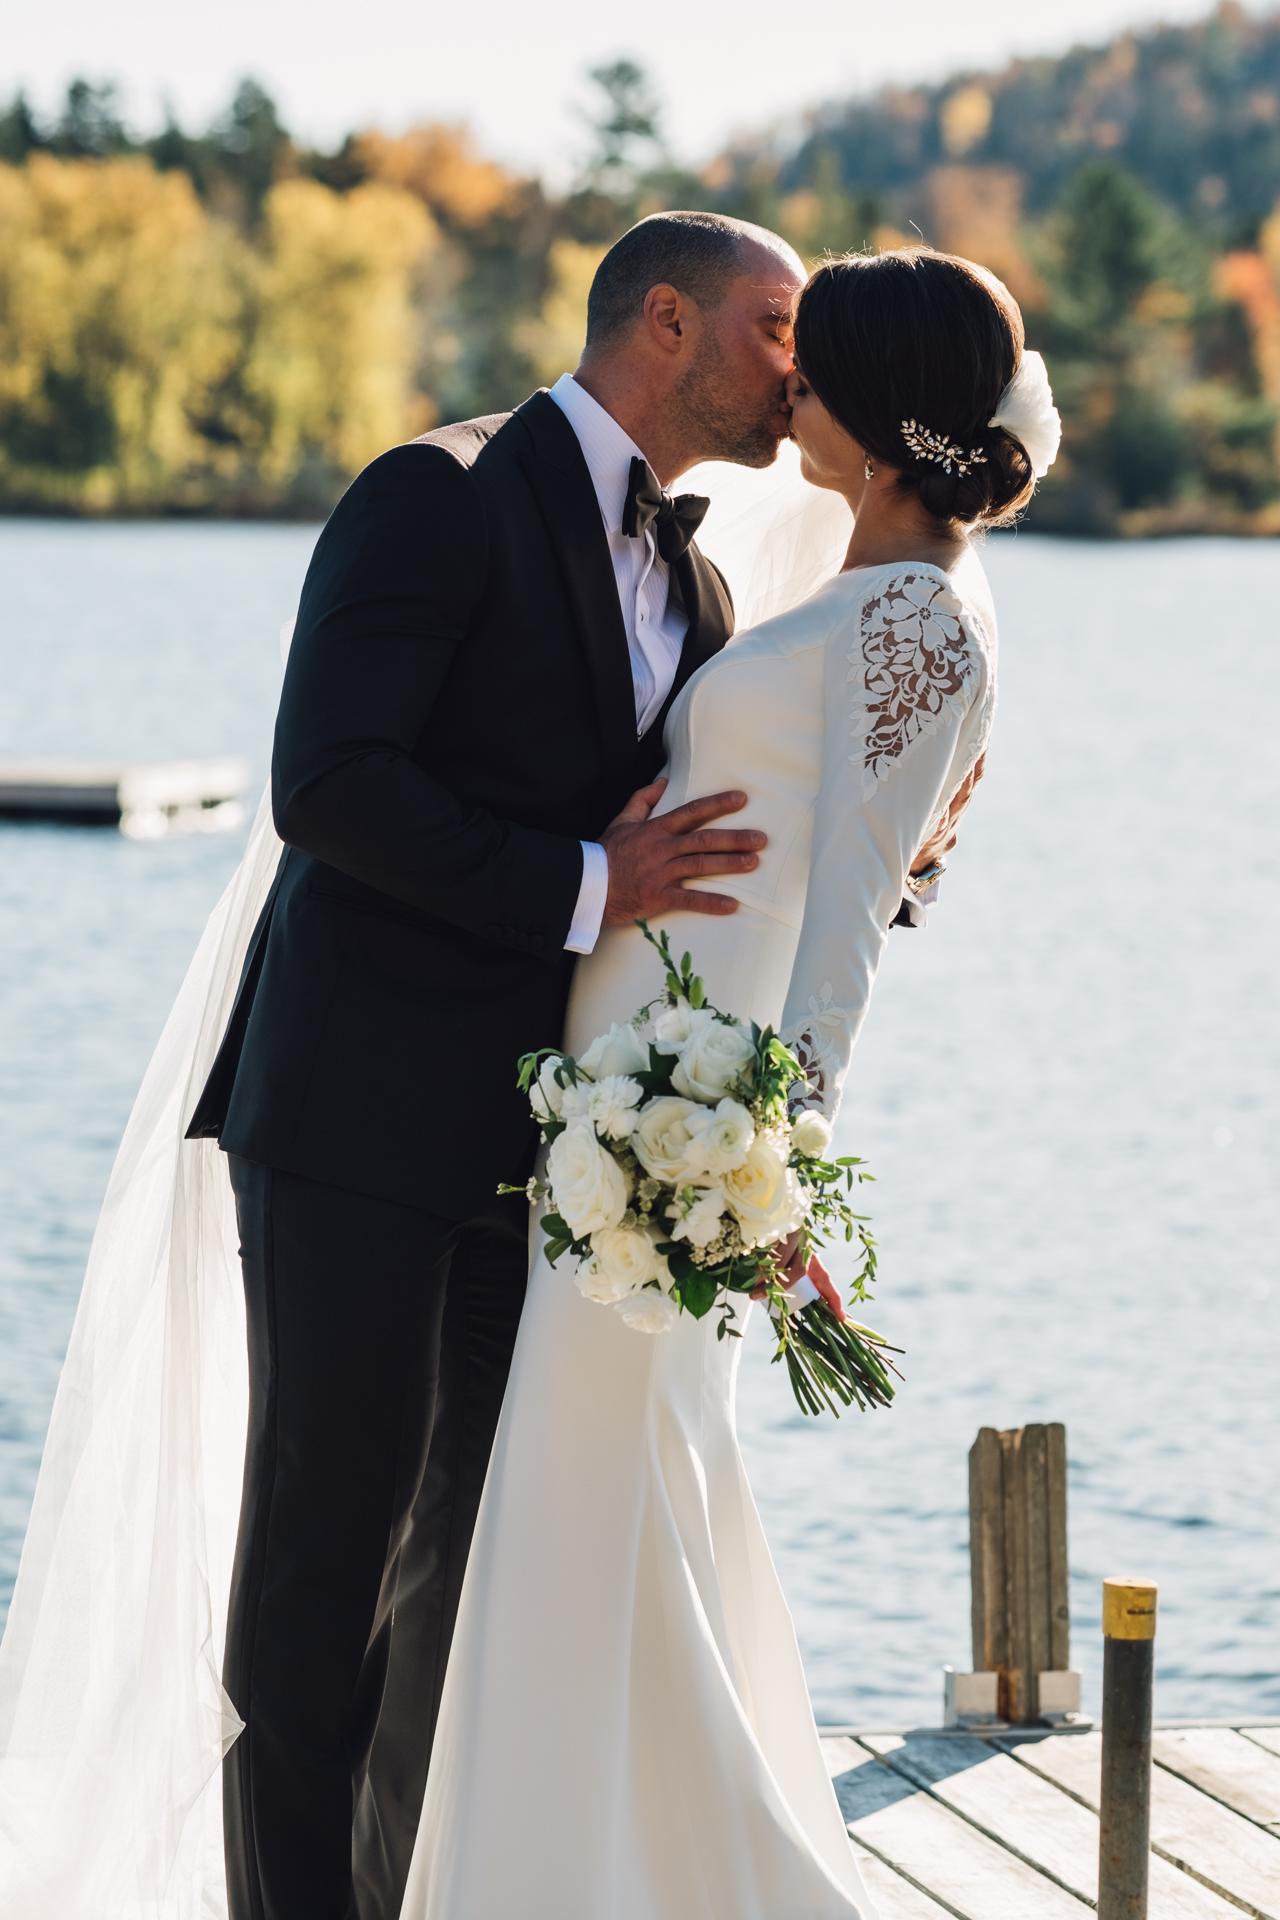 Photographe-mariage-mont-tremblant-31